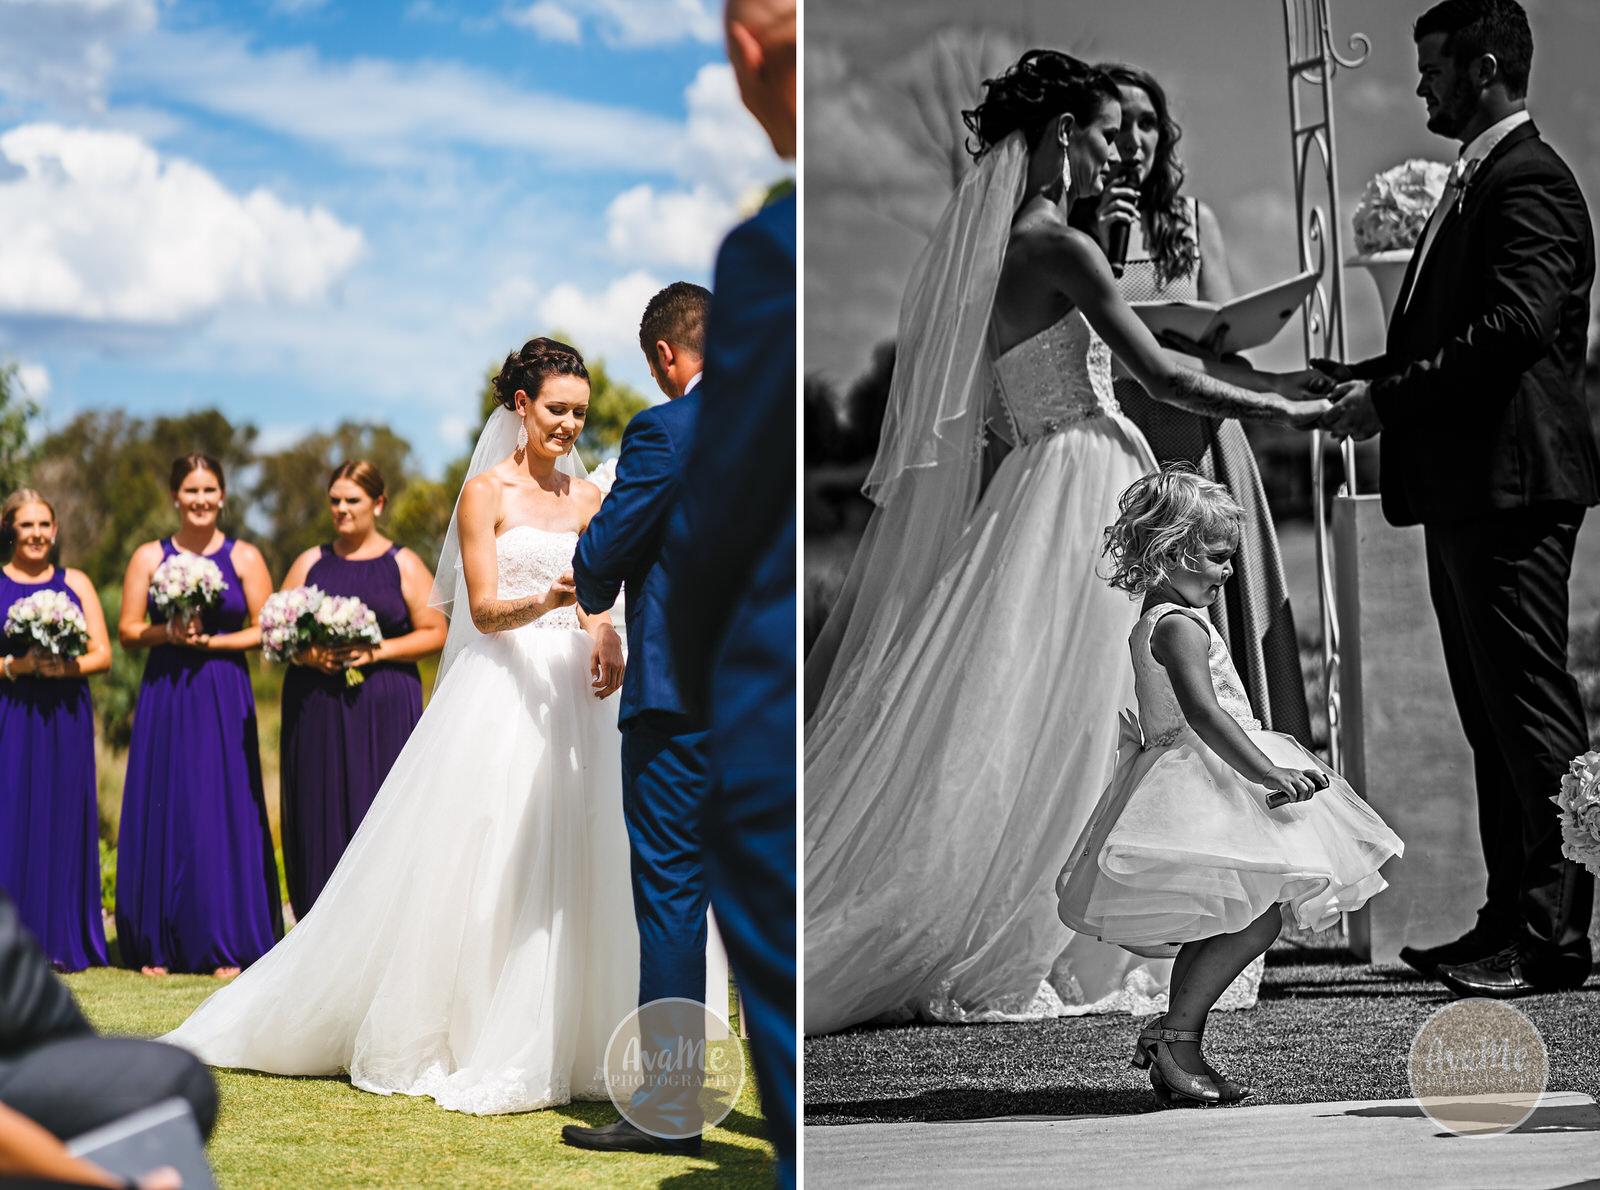 nat-josh-stonecutters-golf-club-wedding-colebee-story-7